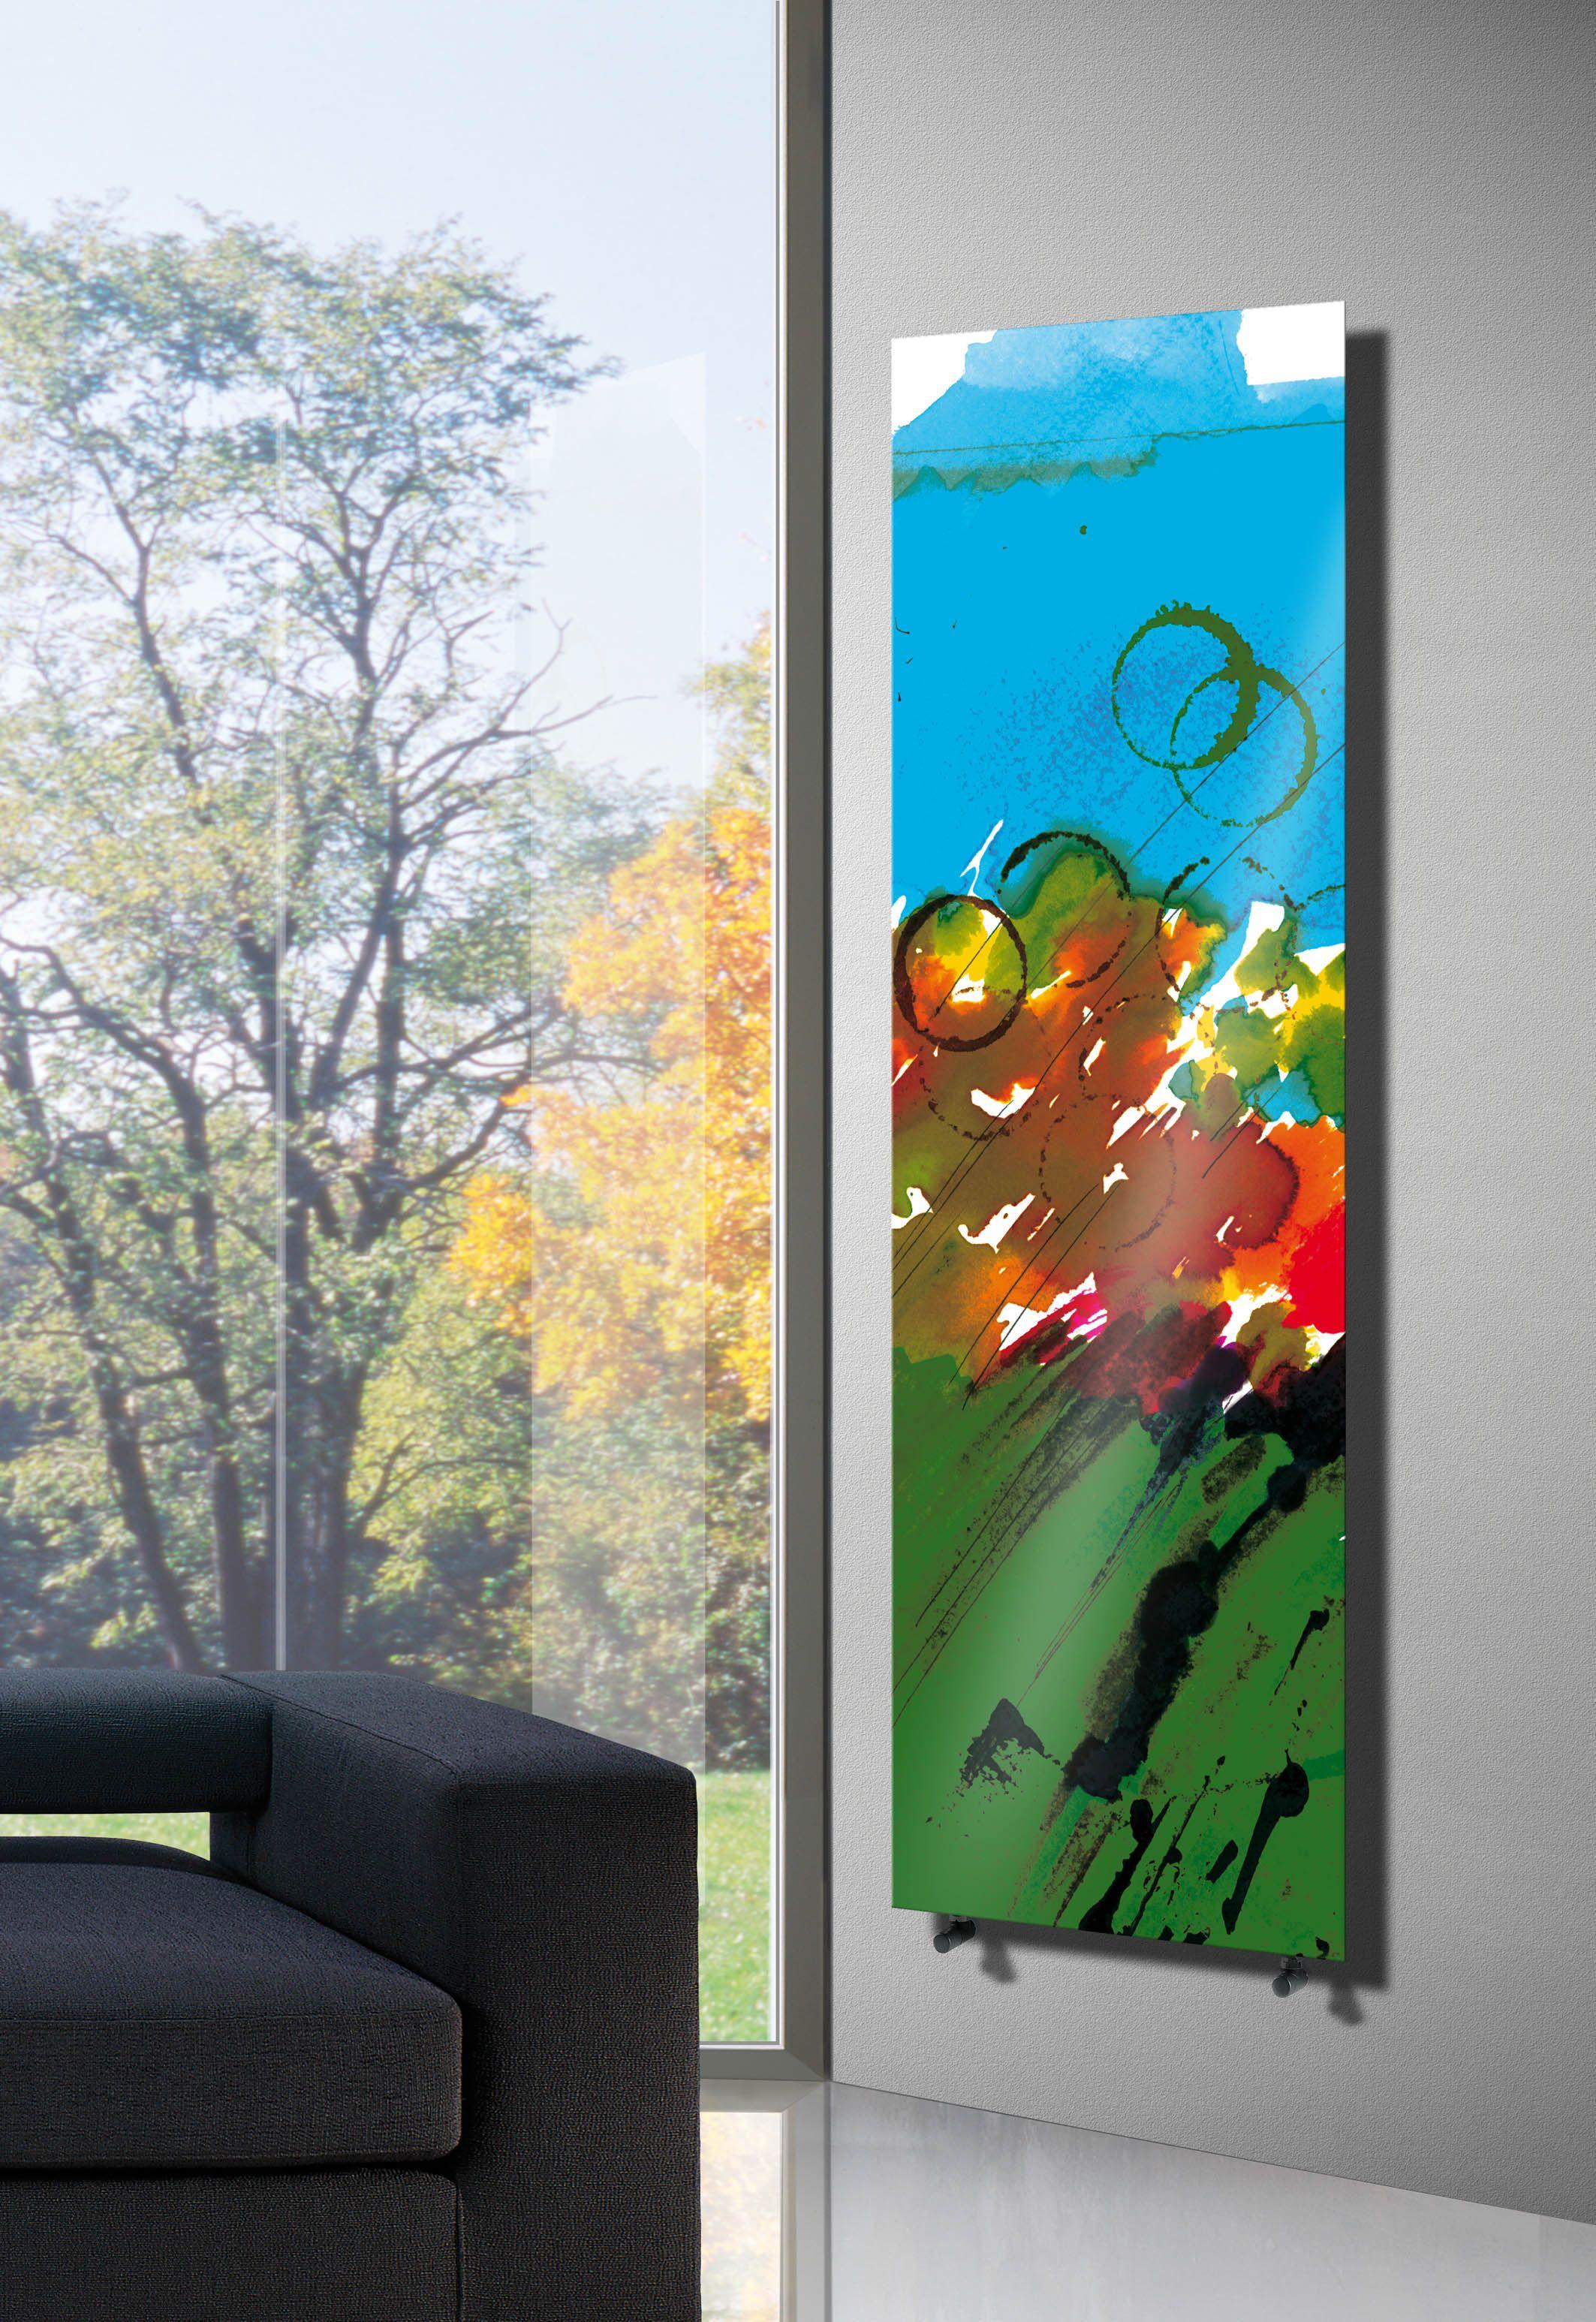 Radiateur d coratif panneau mural frame season collection neo design by cordivari design - Panneau mural decoratif ...